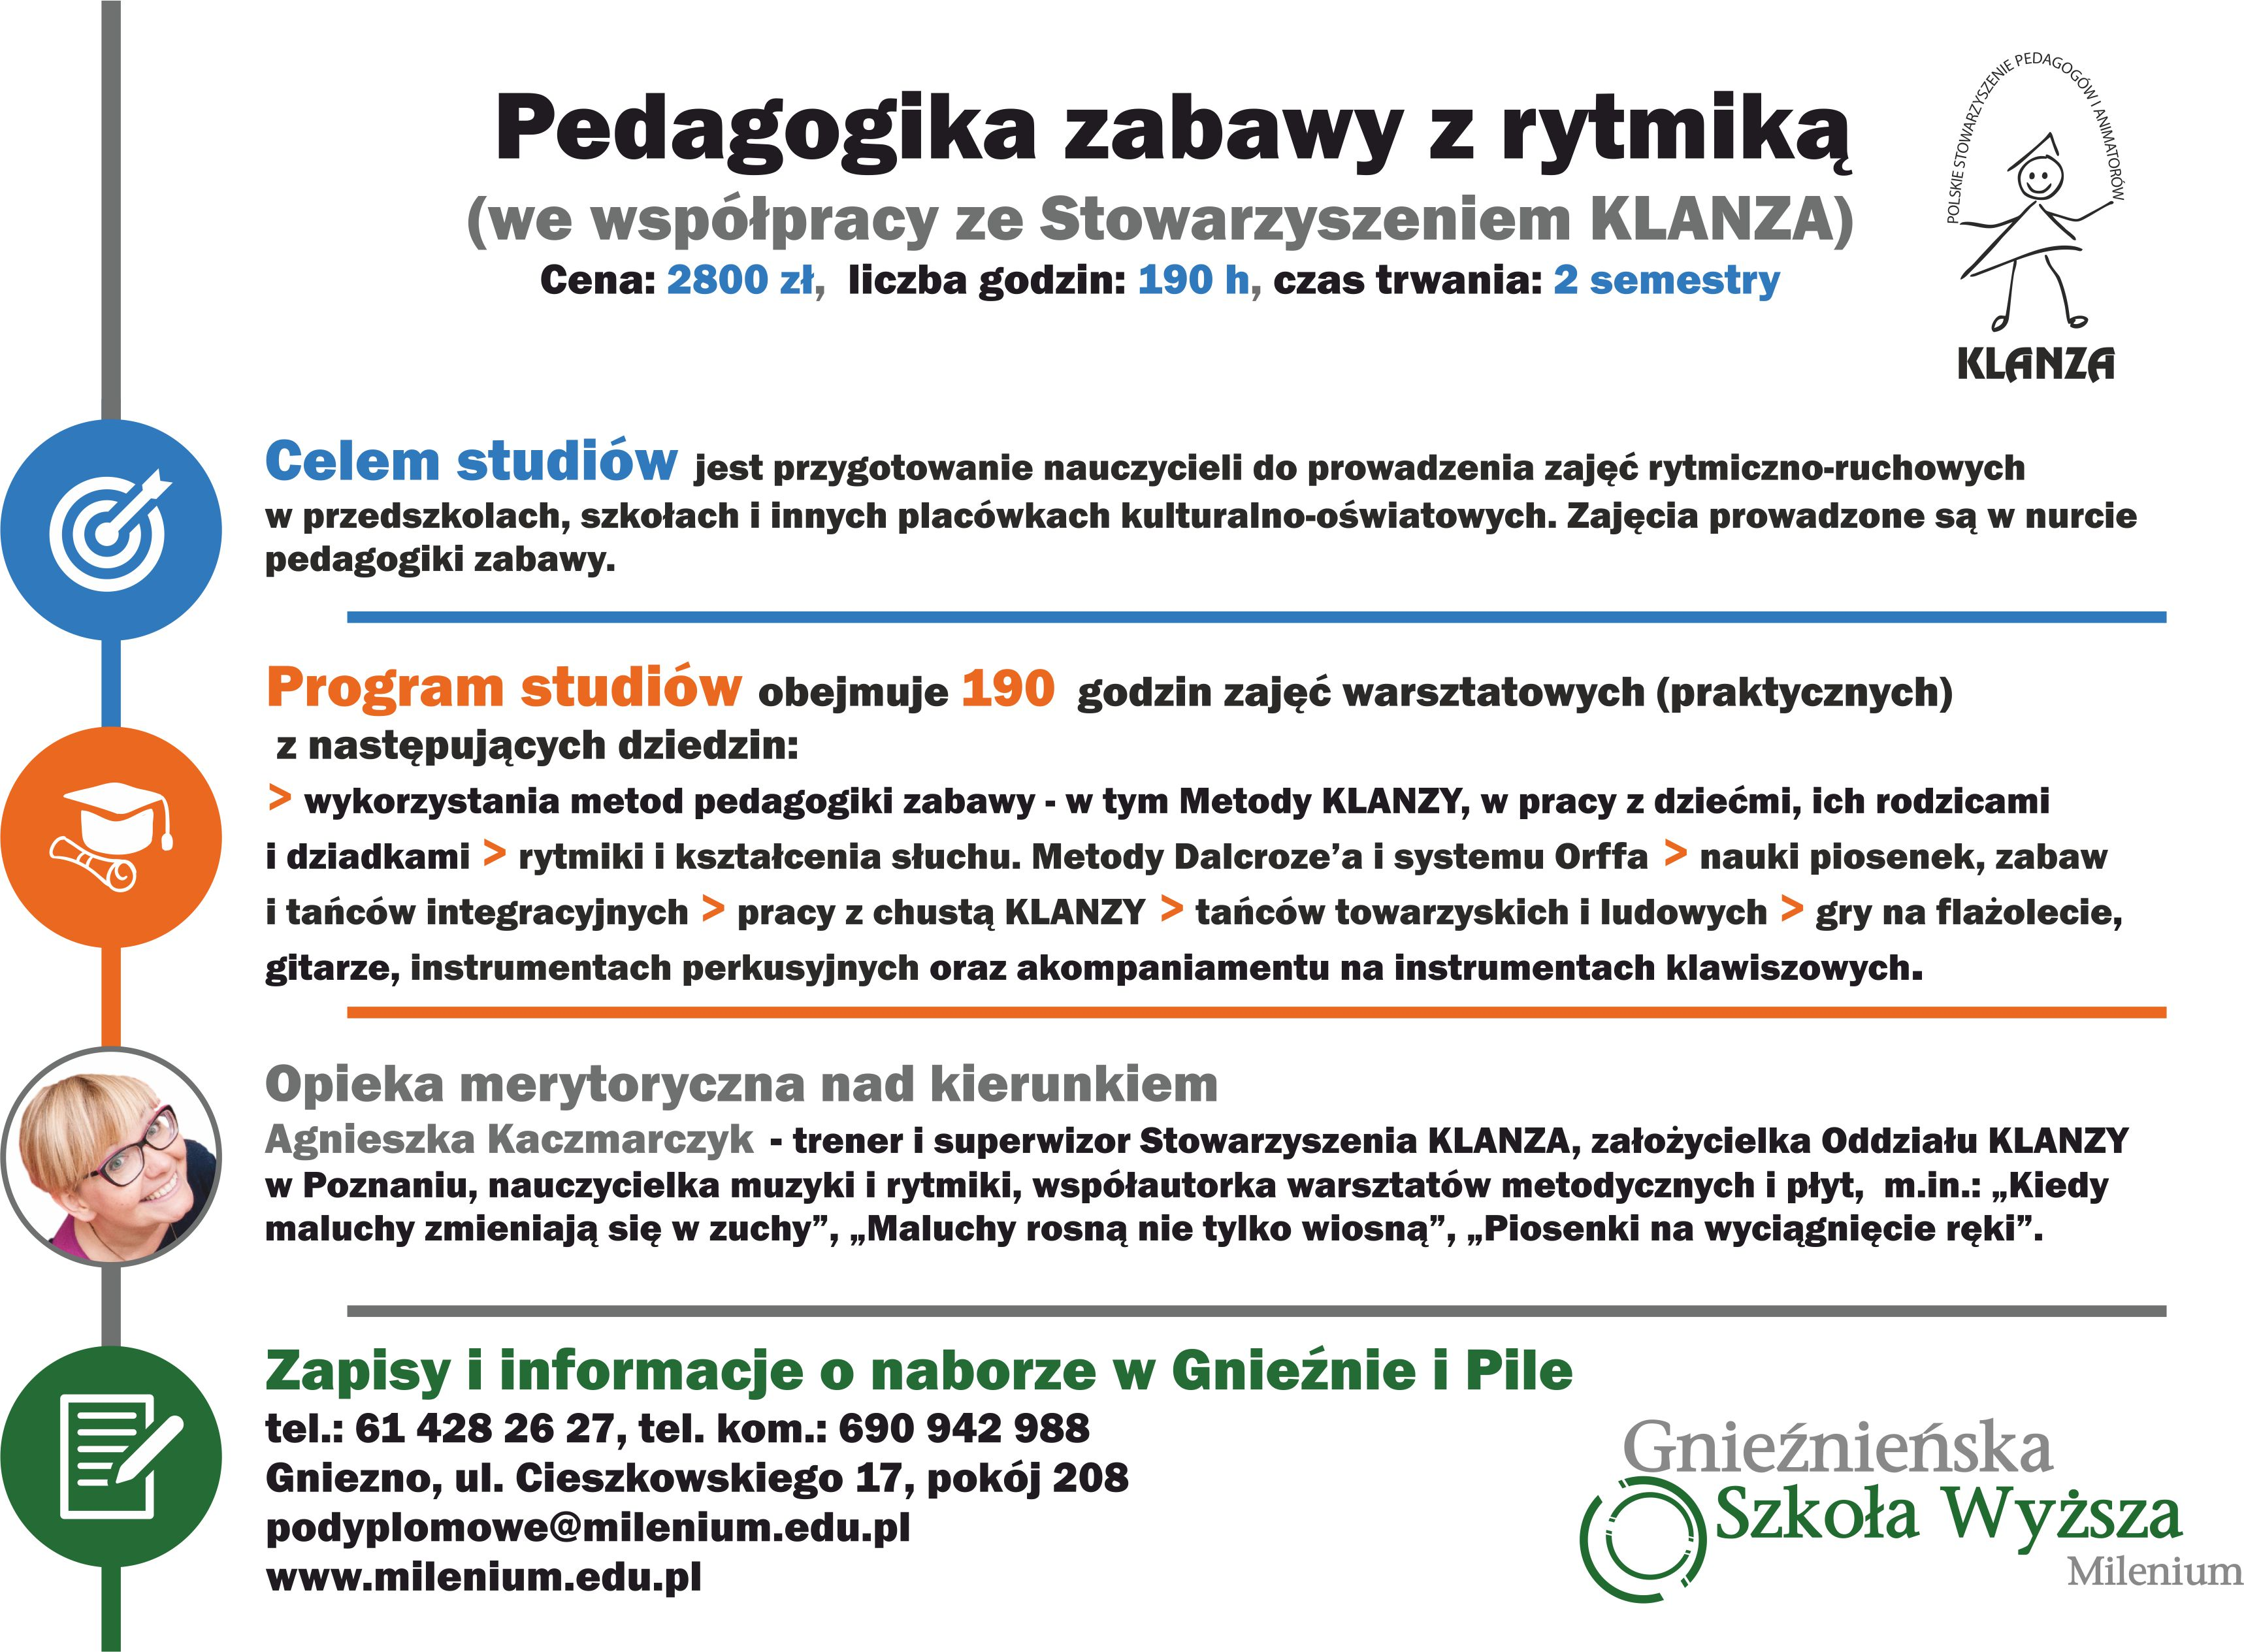 pedagogika-z-rytmika.jpg